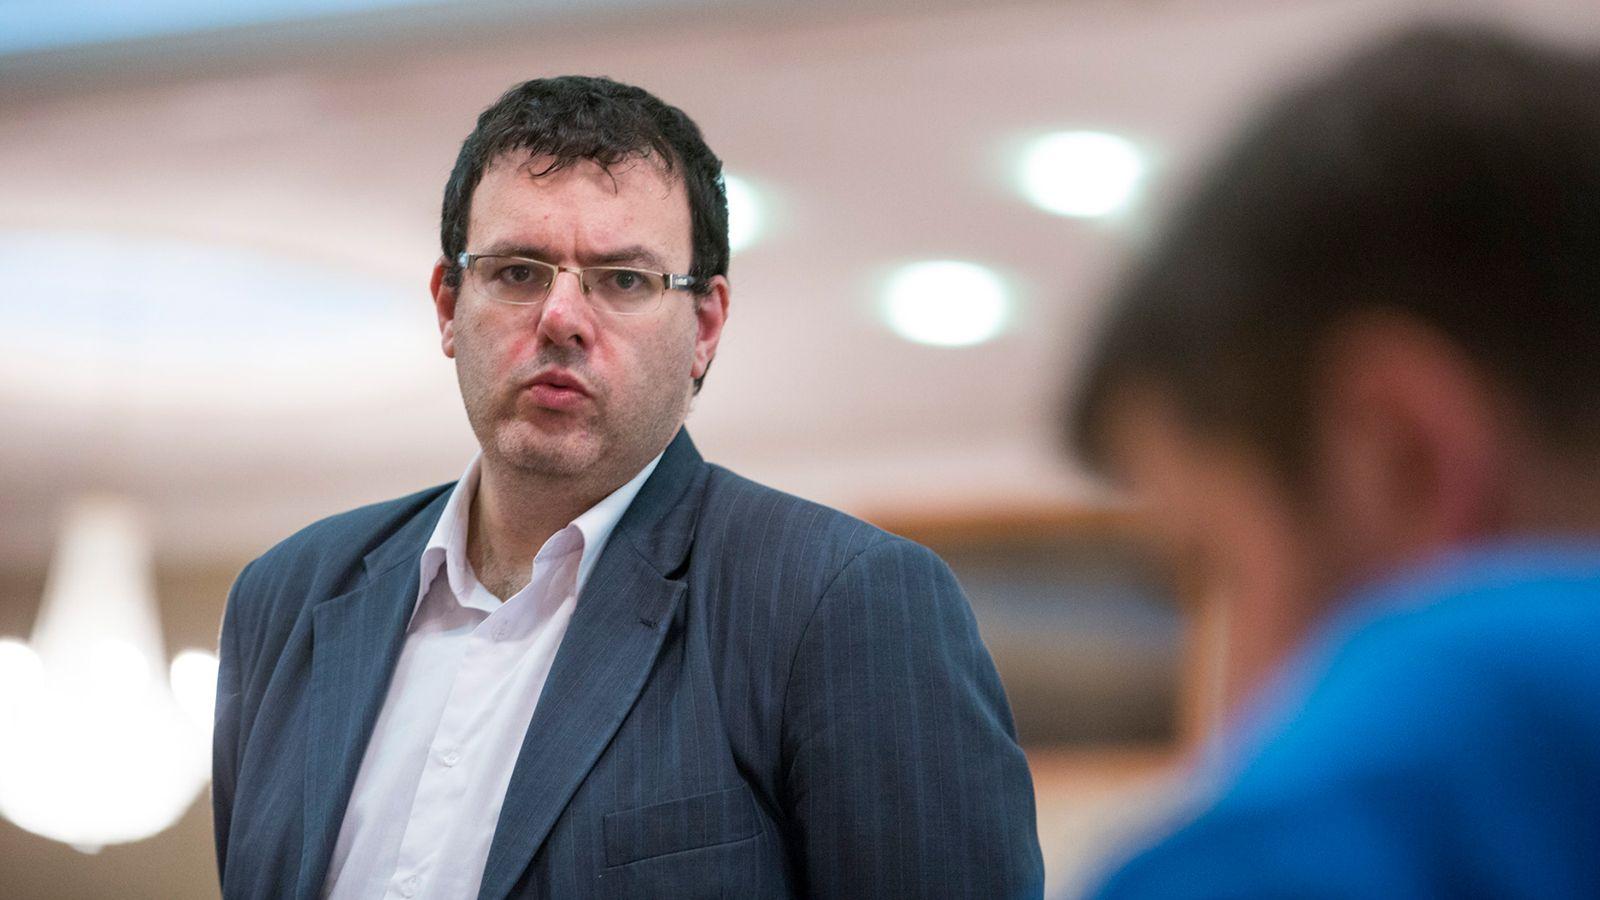 FIDE Director Emil Sutovsky